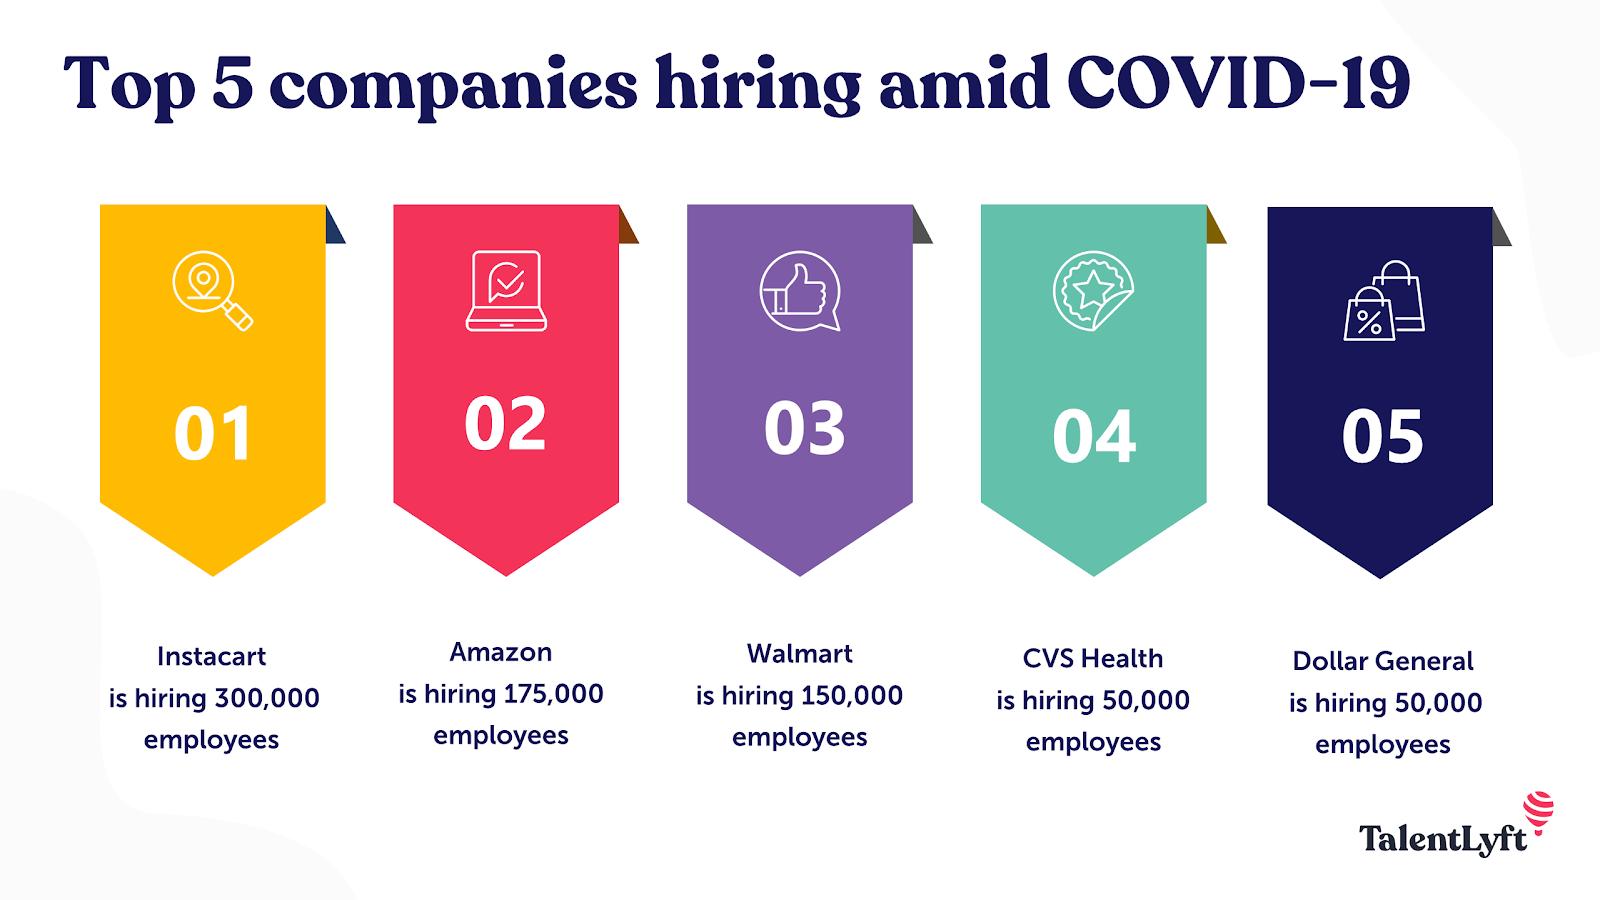 companies hiring amidst coronavirus crisis